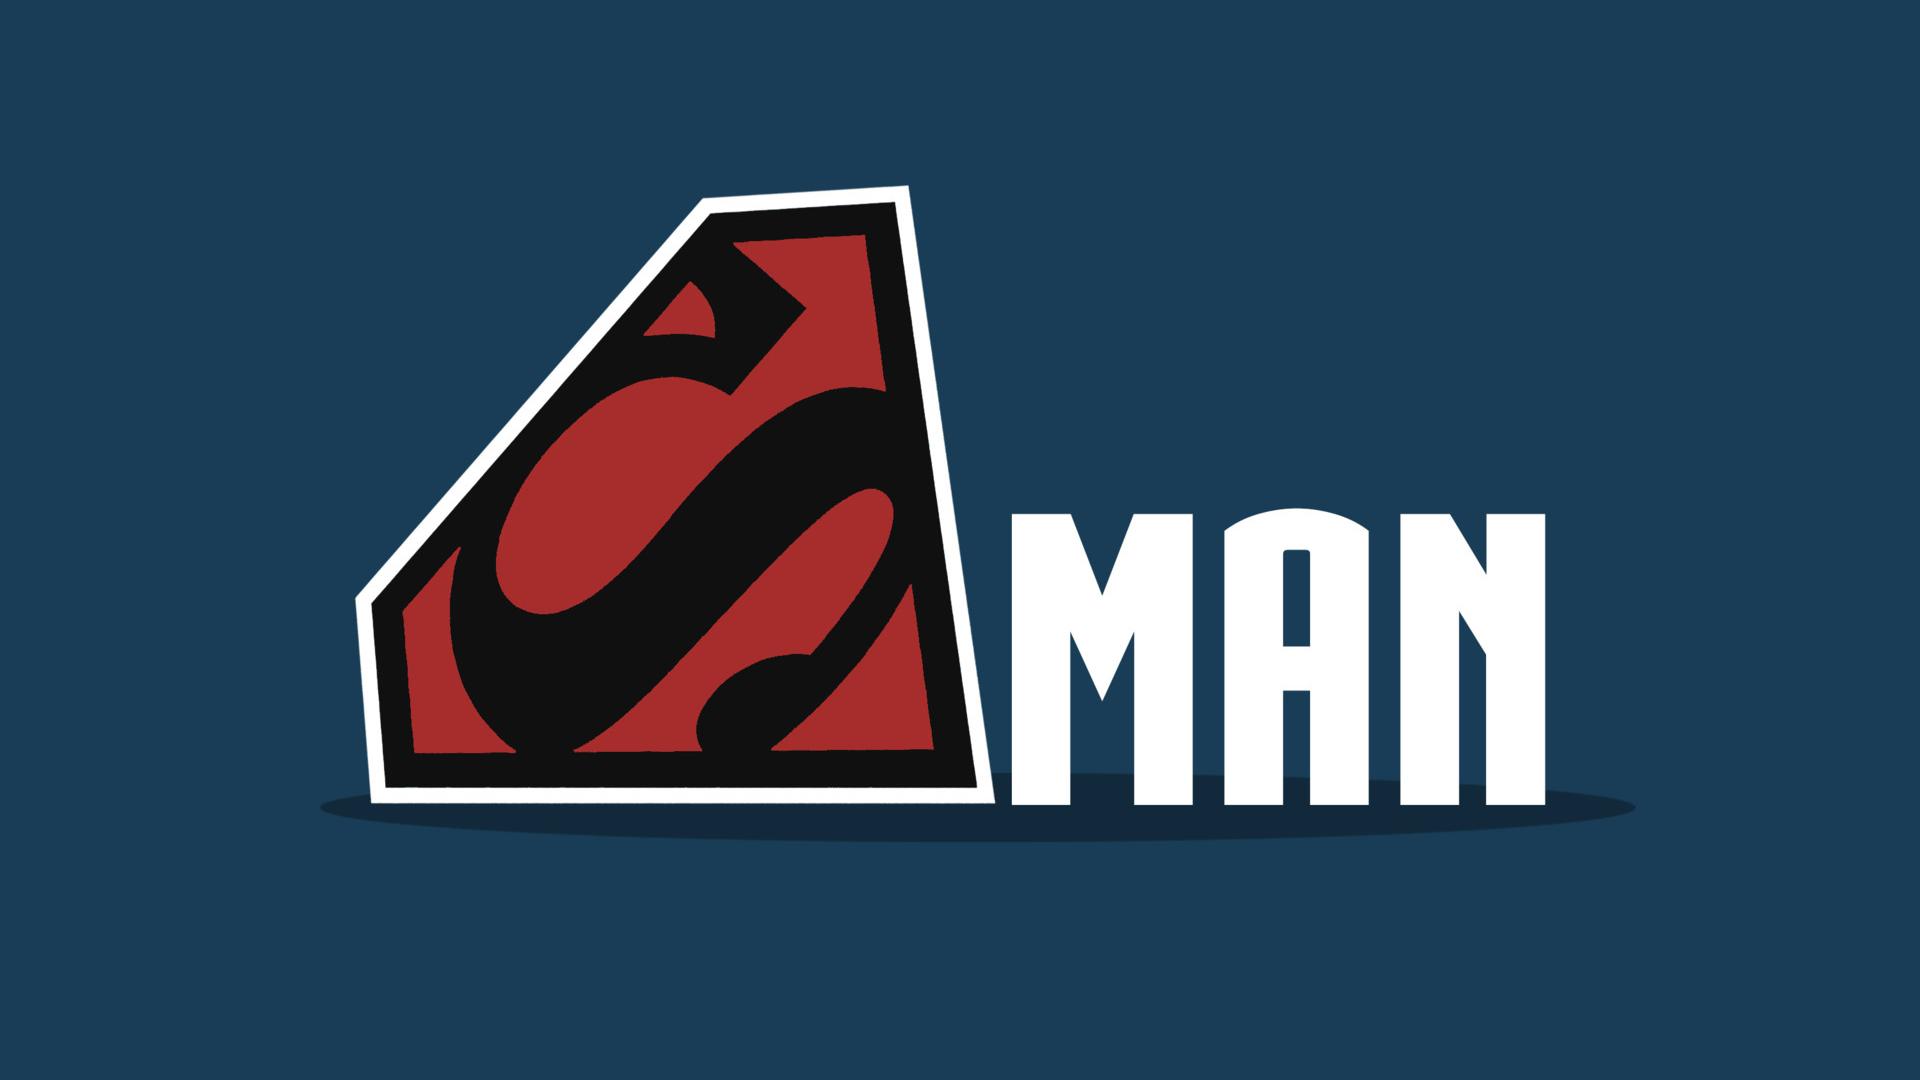 1920x1080 superman logo minimalism laptop full hd 1080p hd 4k superman logo minimalism e3g voltagebd Choice Image